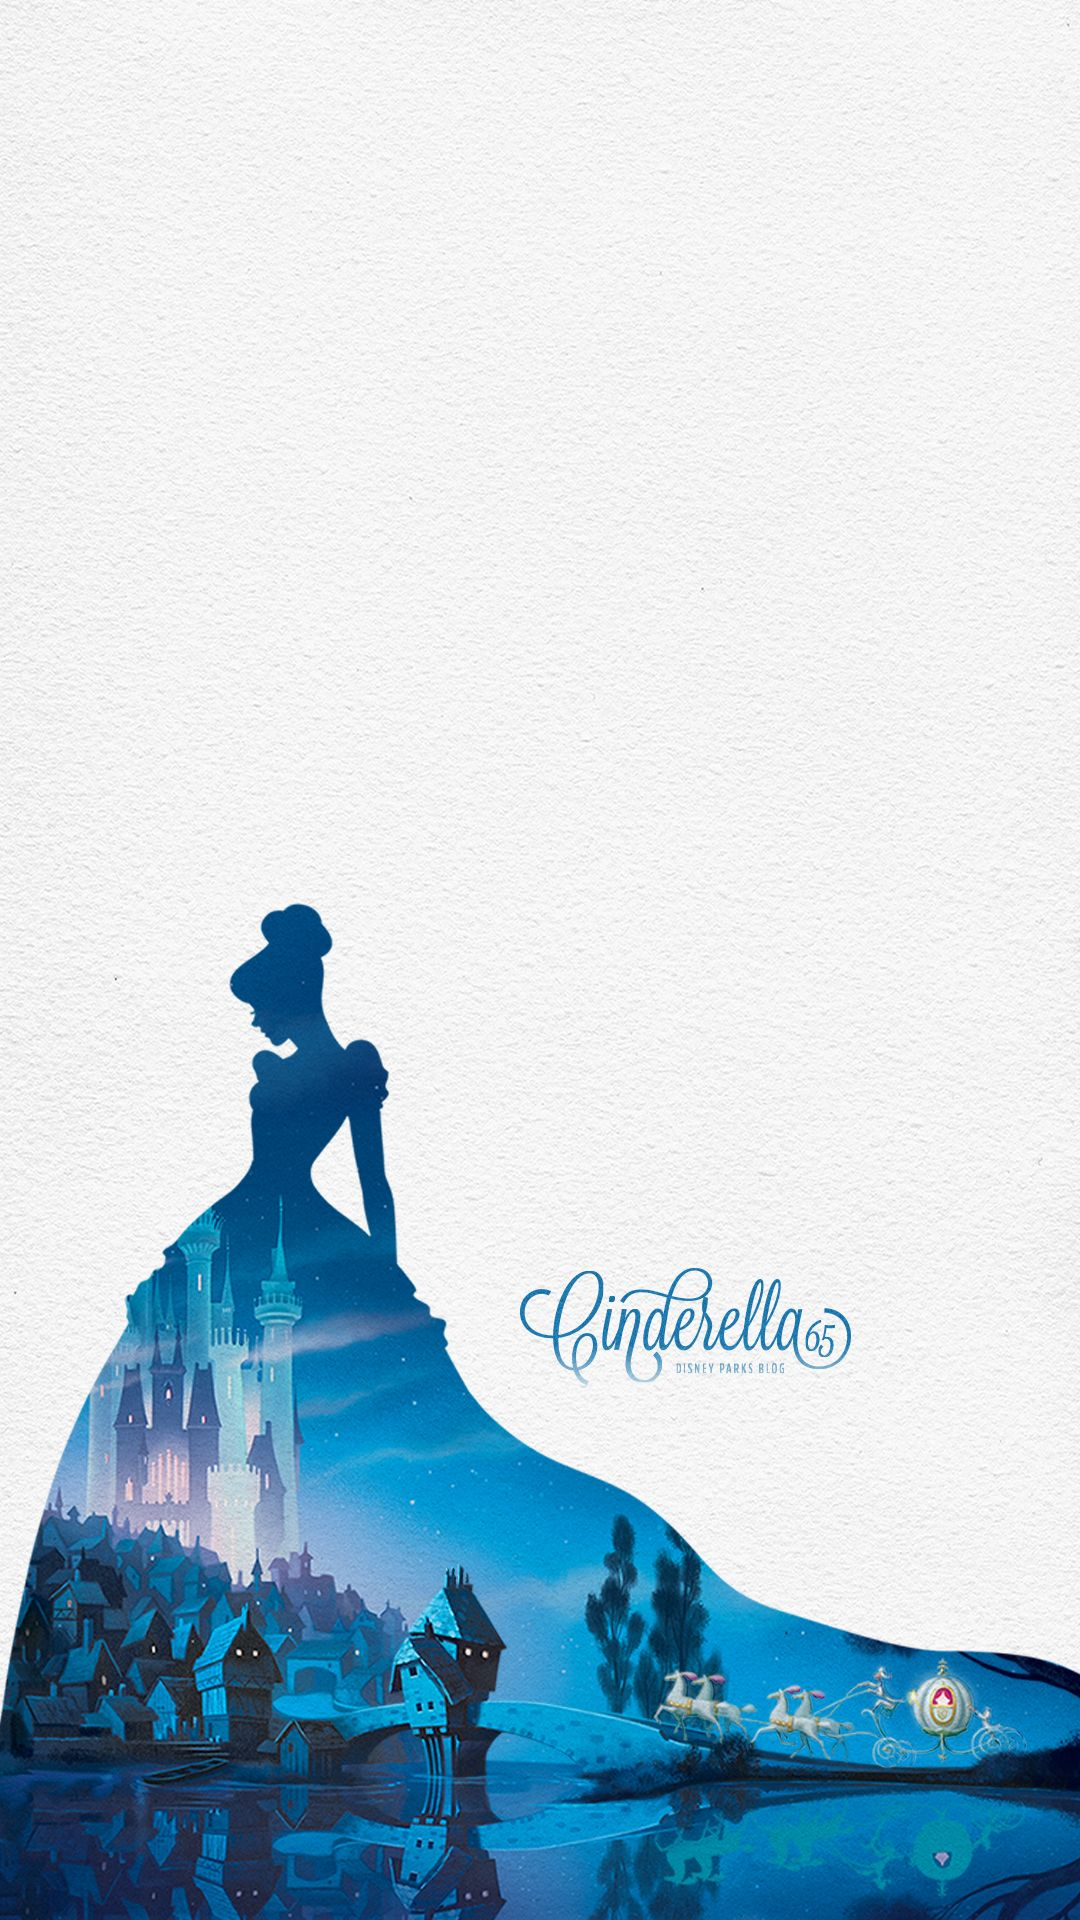 Cinderella Find More Disney Wallpapers For Your Iphone Android Prettywallpaper Wallpaper Iphone Disney Disney Princess Cinderella Disney Artwork